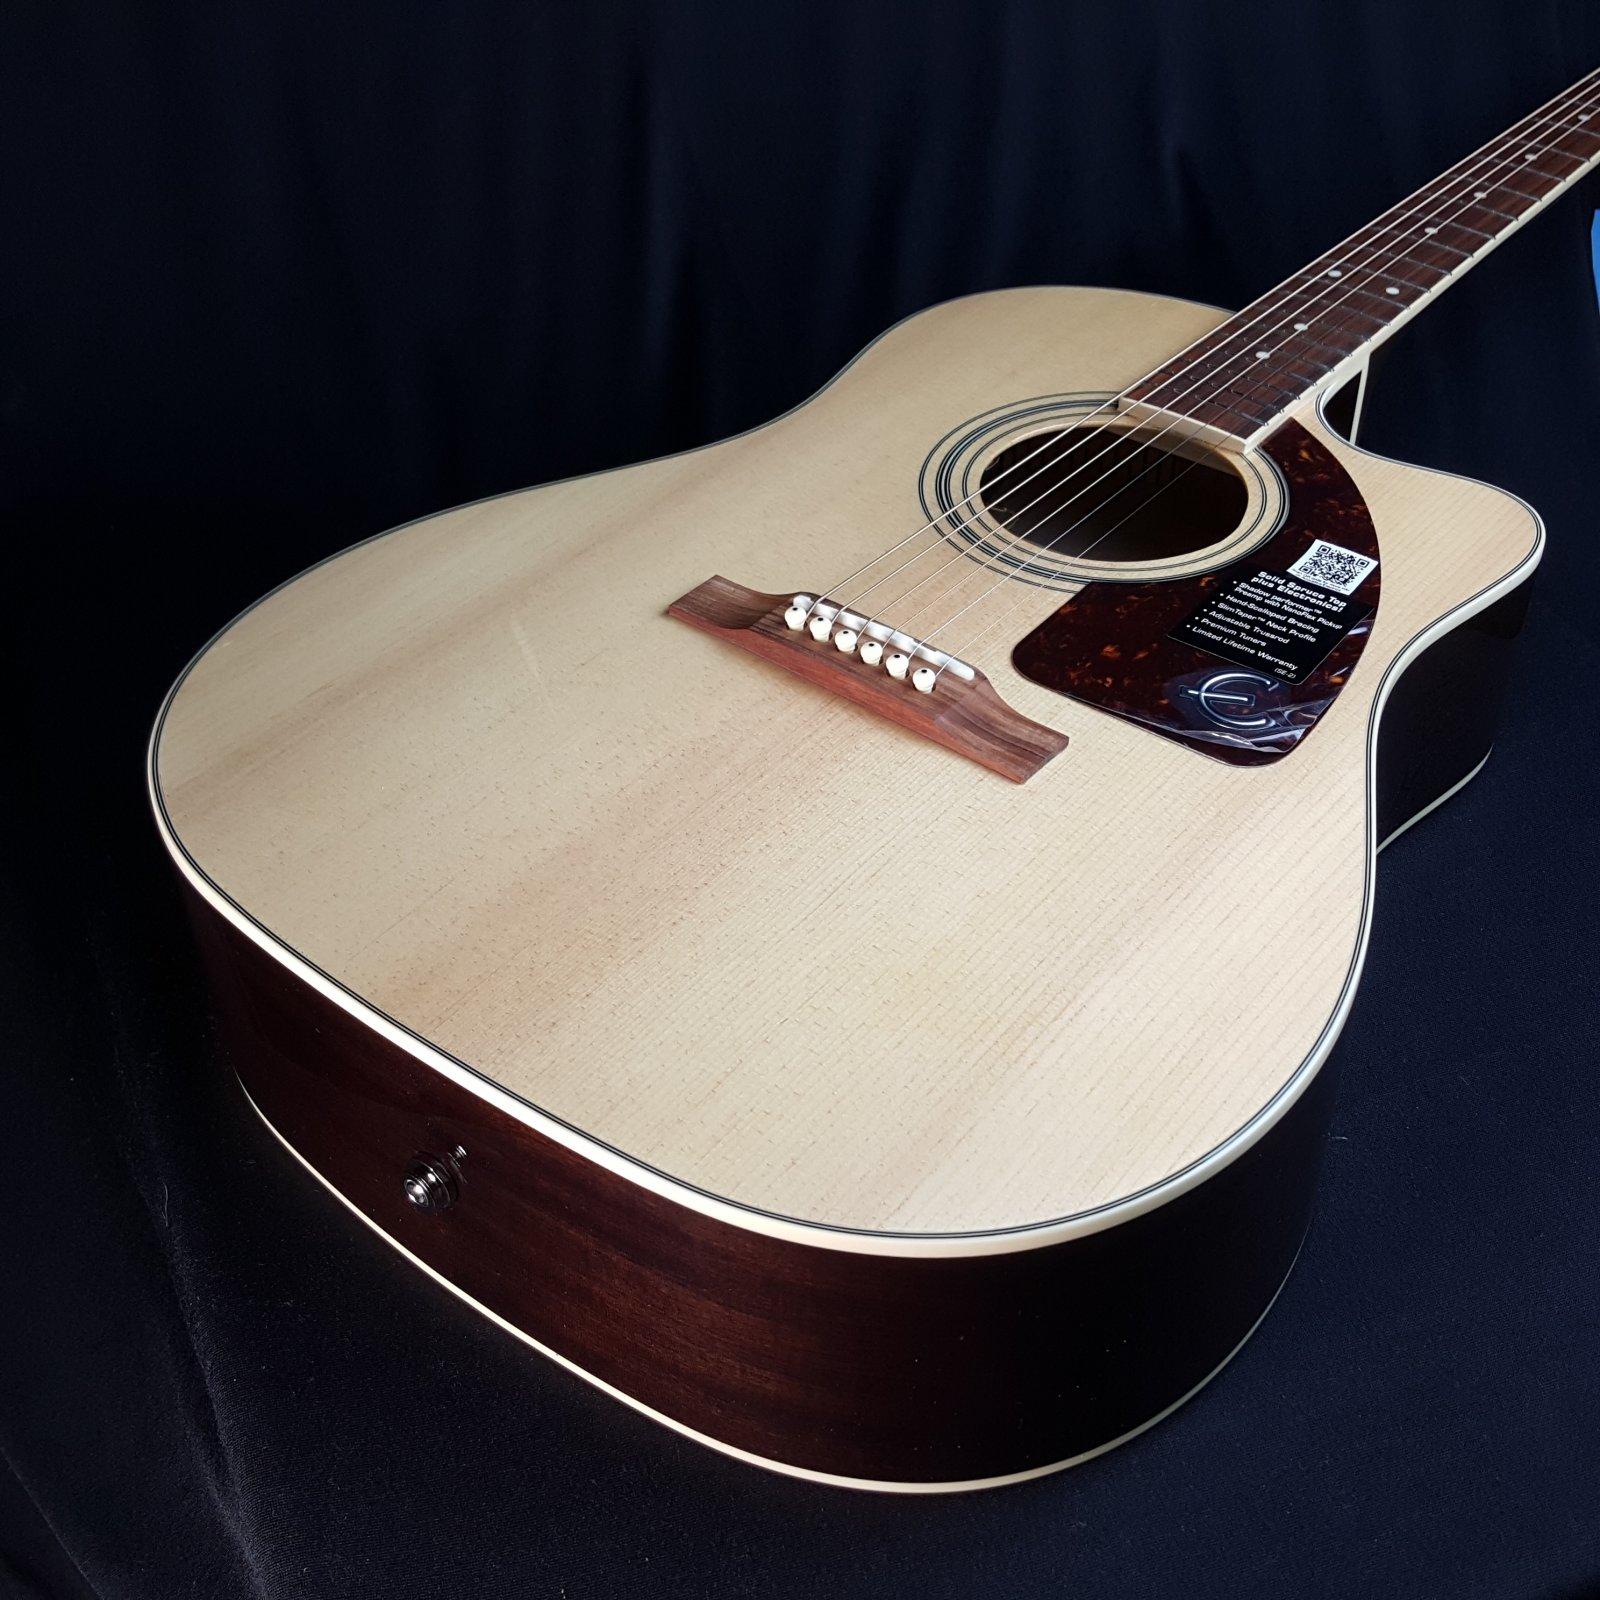 Epiphone AJ-220SCE-N Natural Advanced Jumbo Cutaway Acoustic Electric Guitar